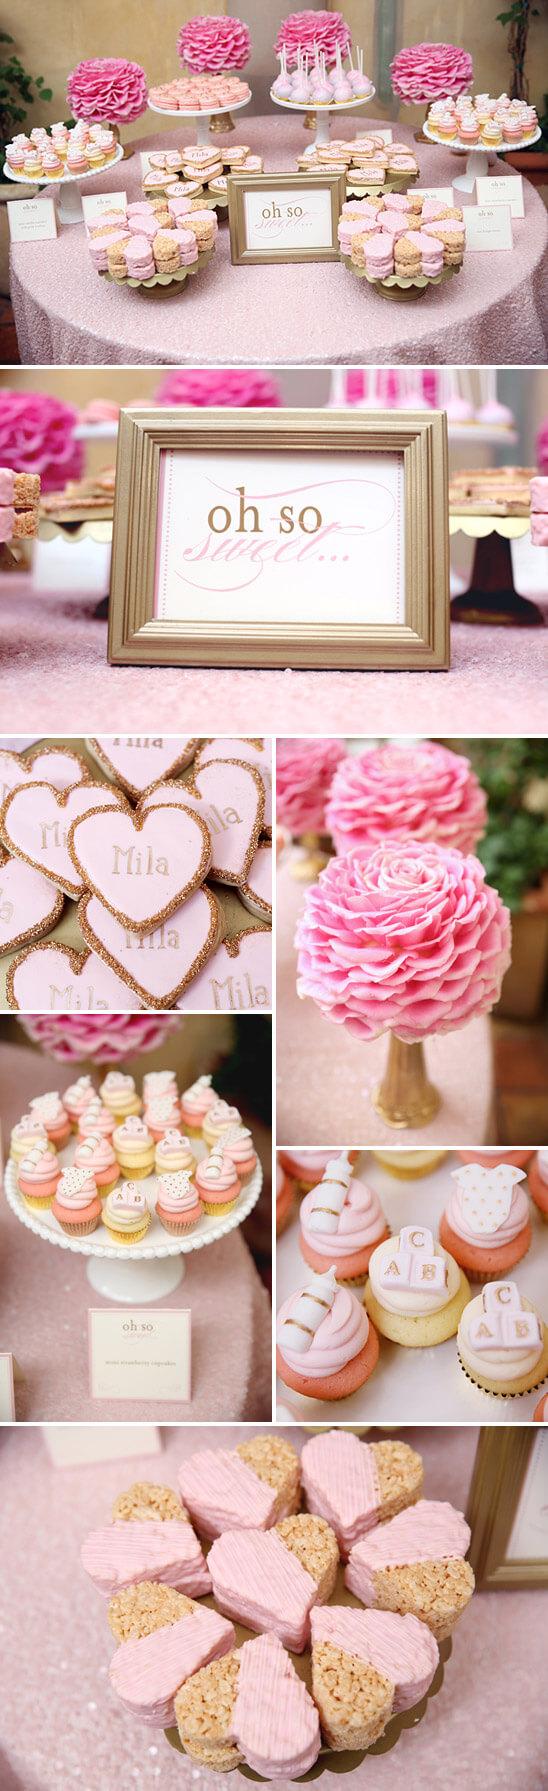 Pink heart baby shower ideas!